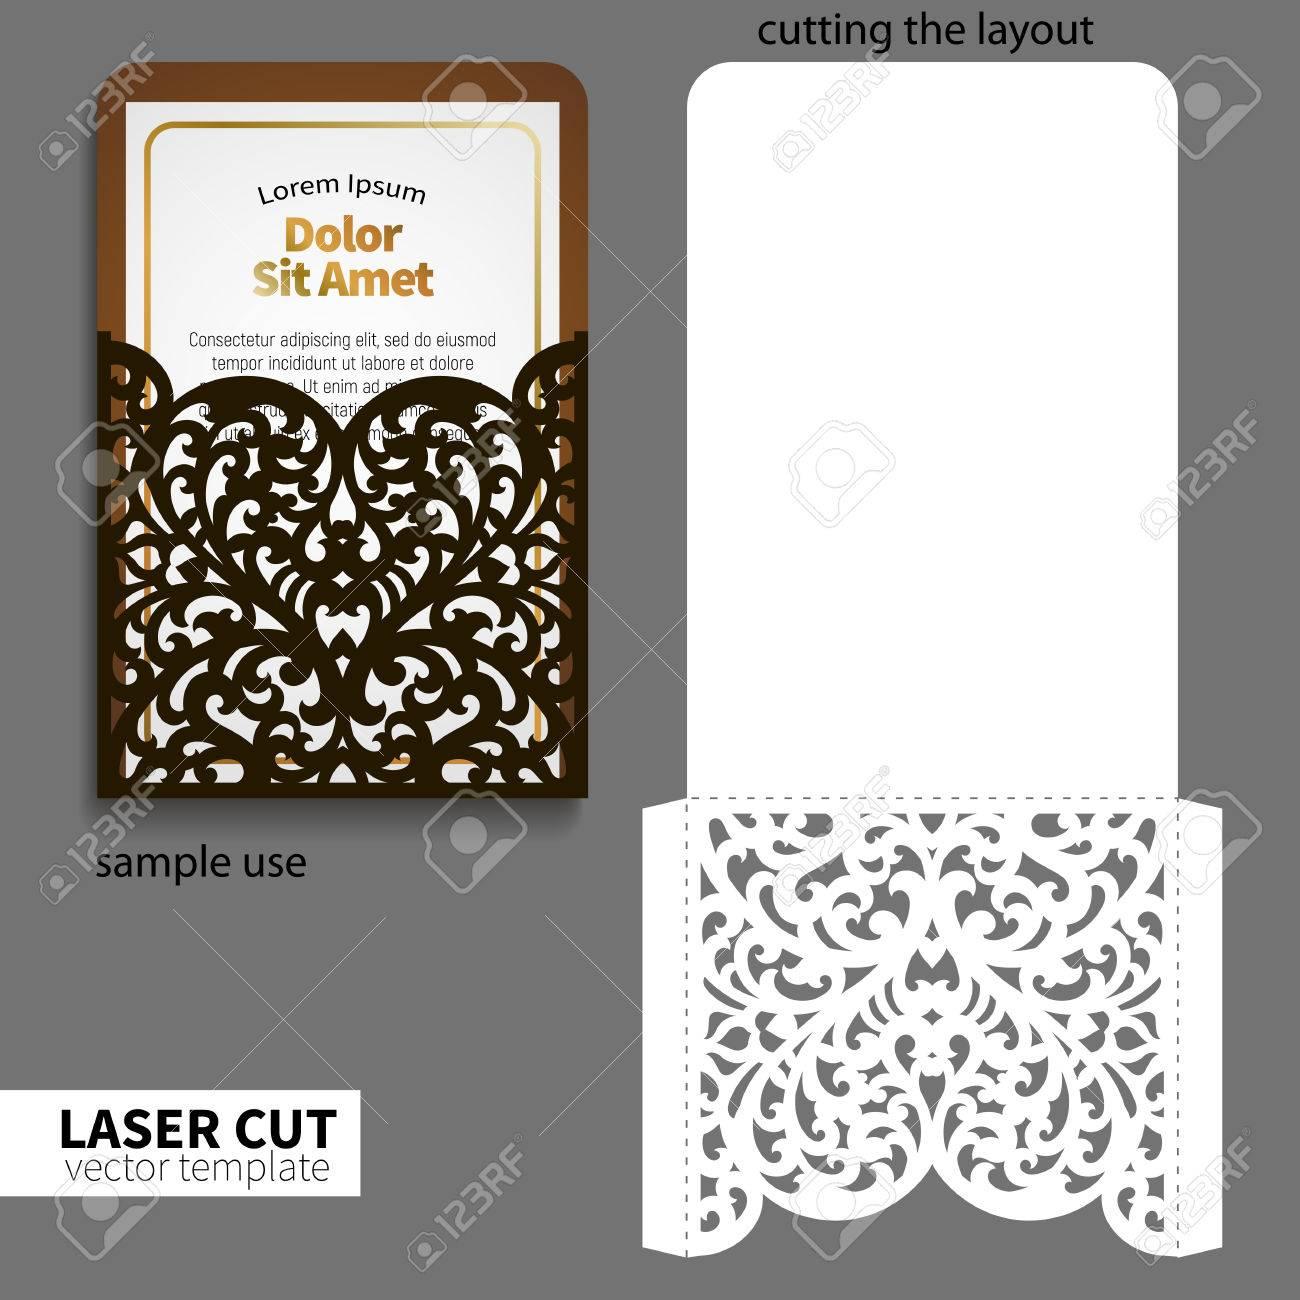 Vector laser cutting. - 72093720